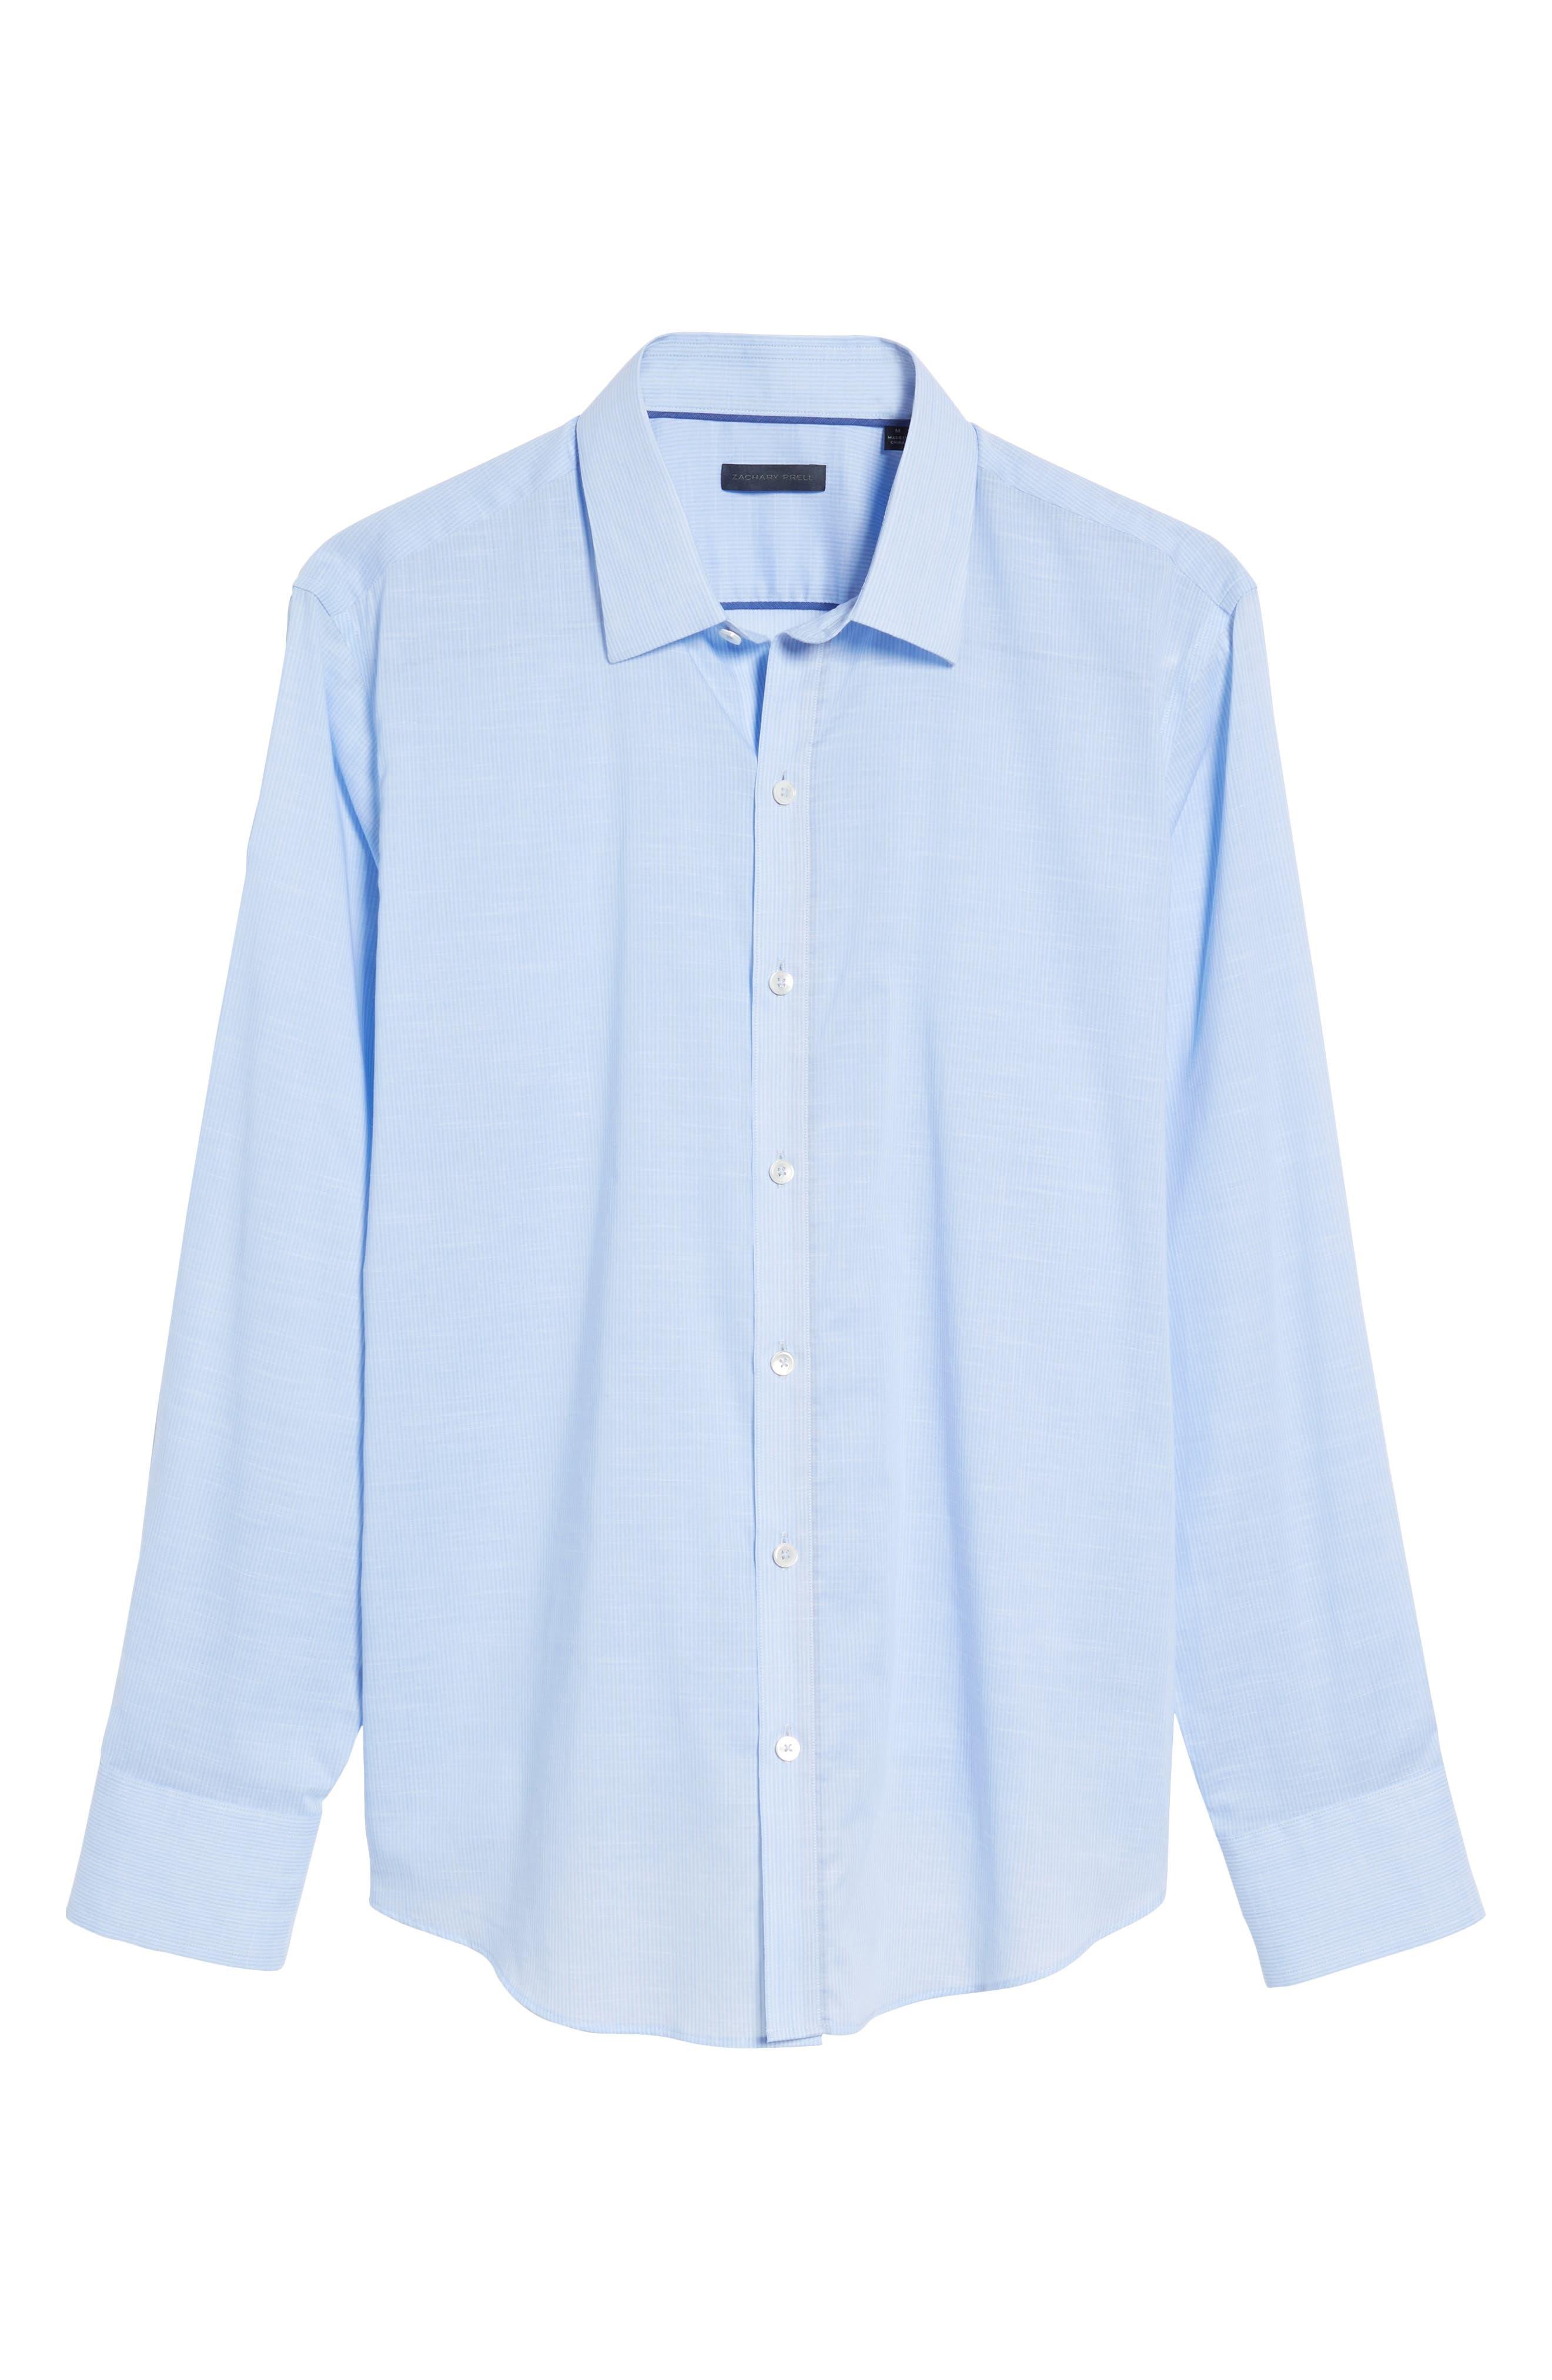 Ridley Slim Fit Texture Sport Shirt,                             Alternate thumbnail 6, color,